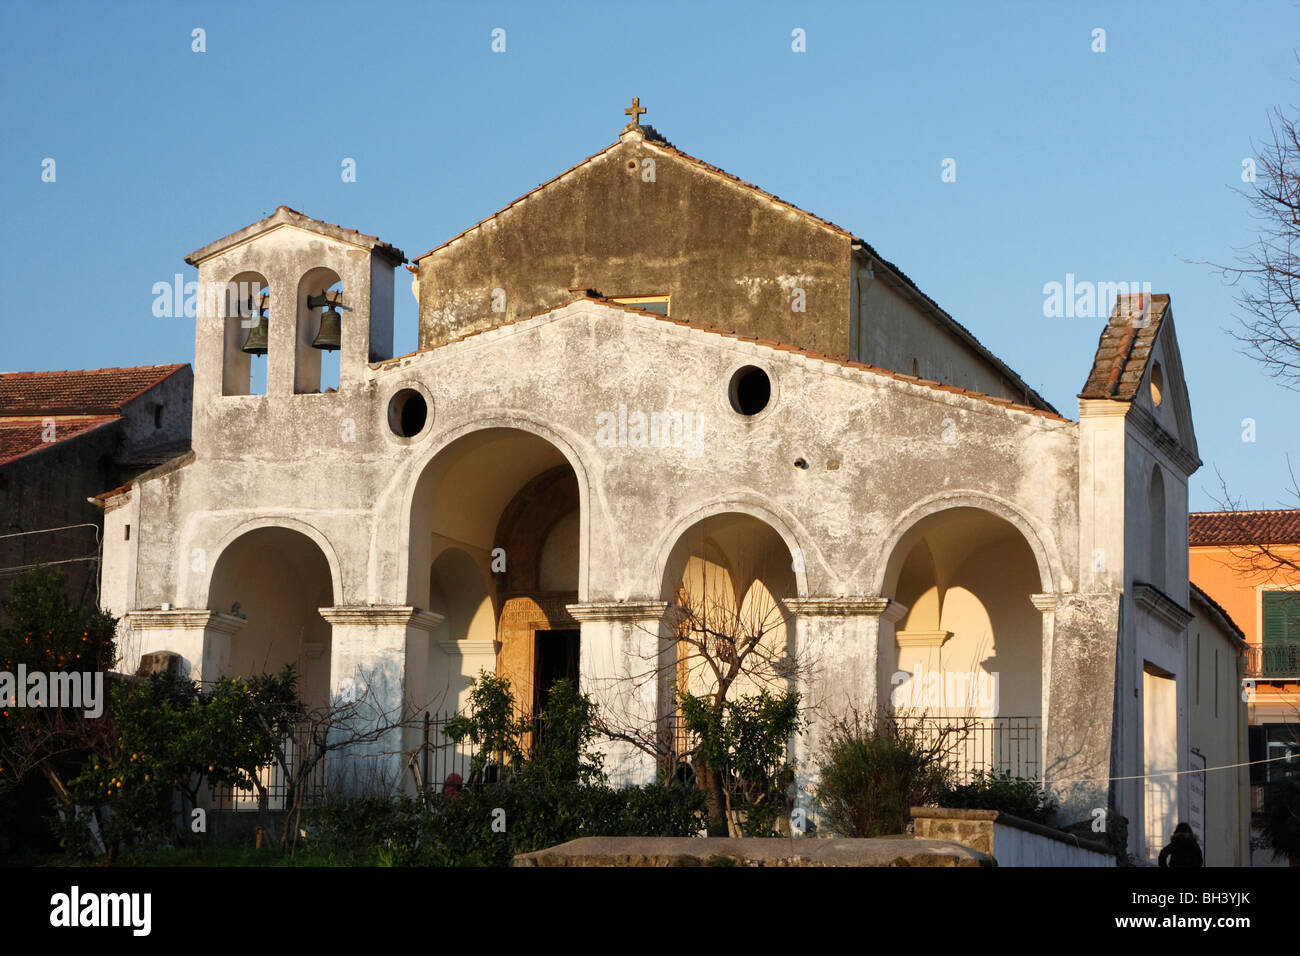 Sant'Agata de' Goti, Benevento province, Campania, Italy Stock Photo